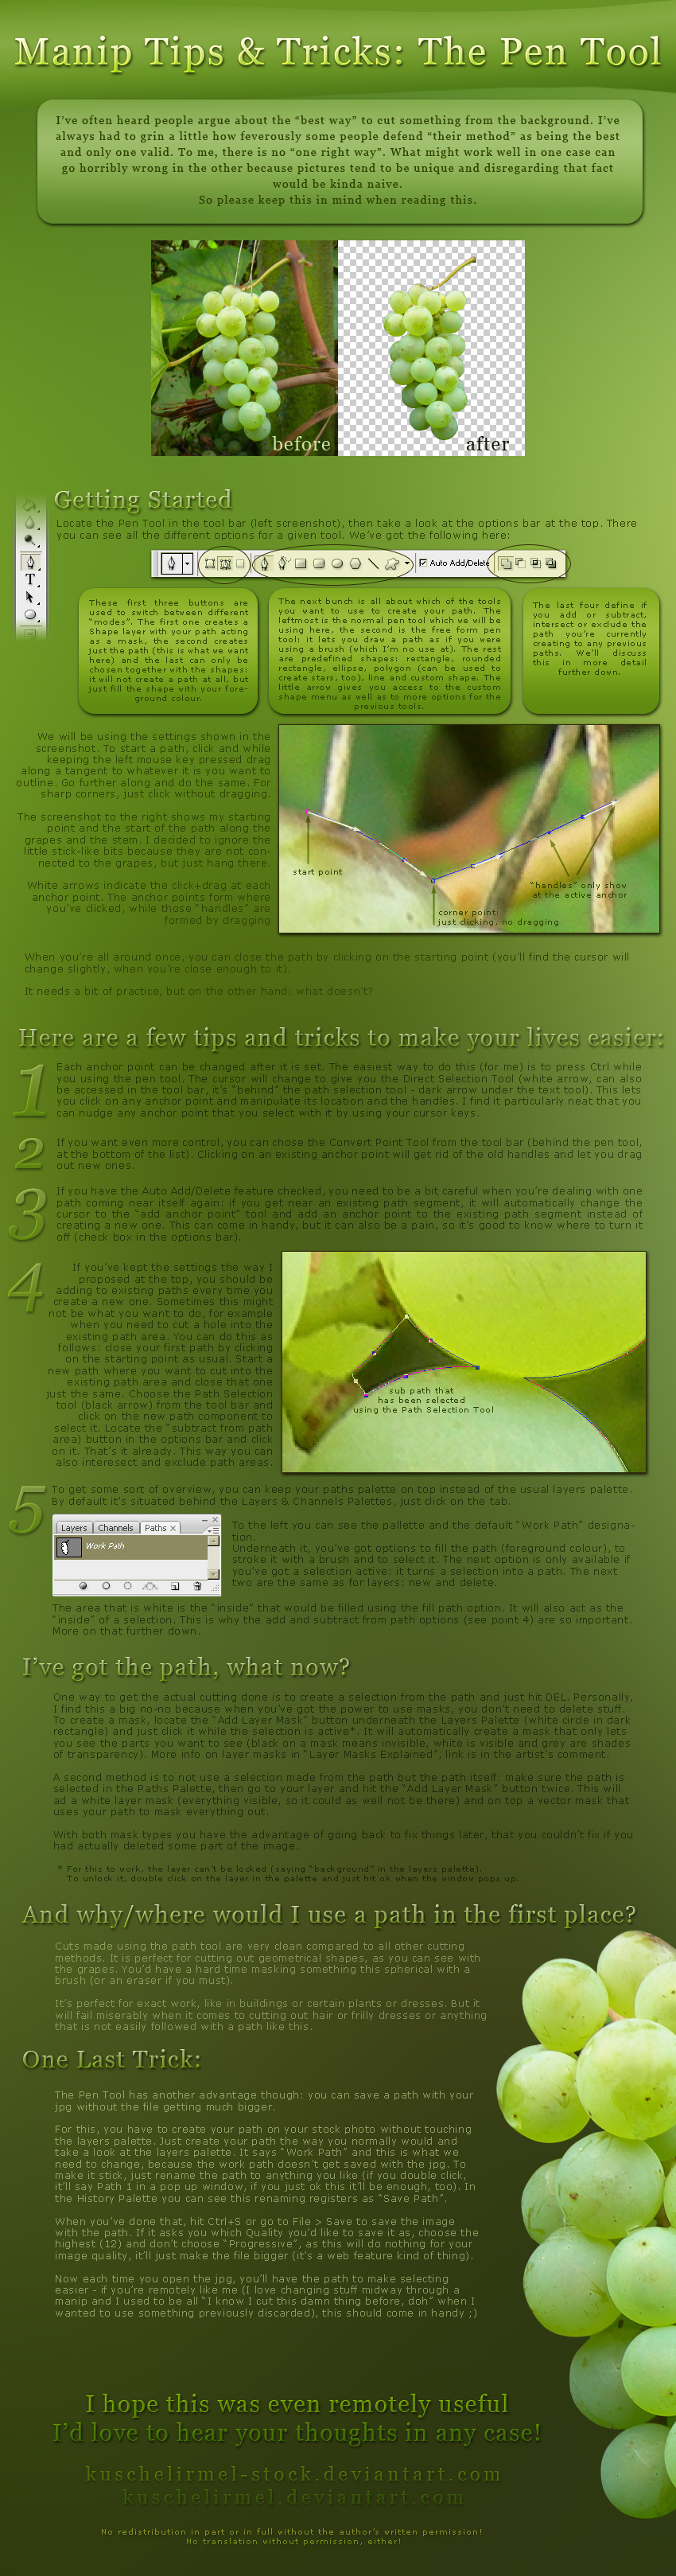 Manip Tips + Tricks: Pen Tool